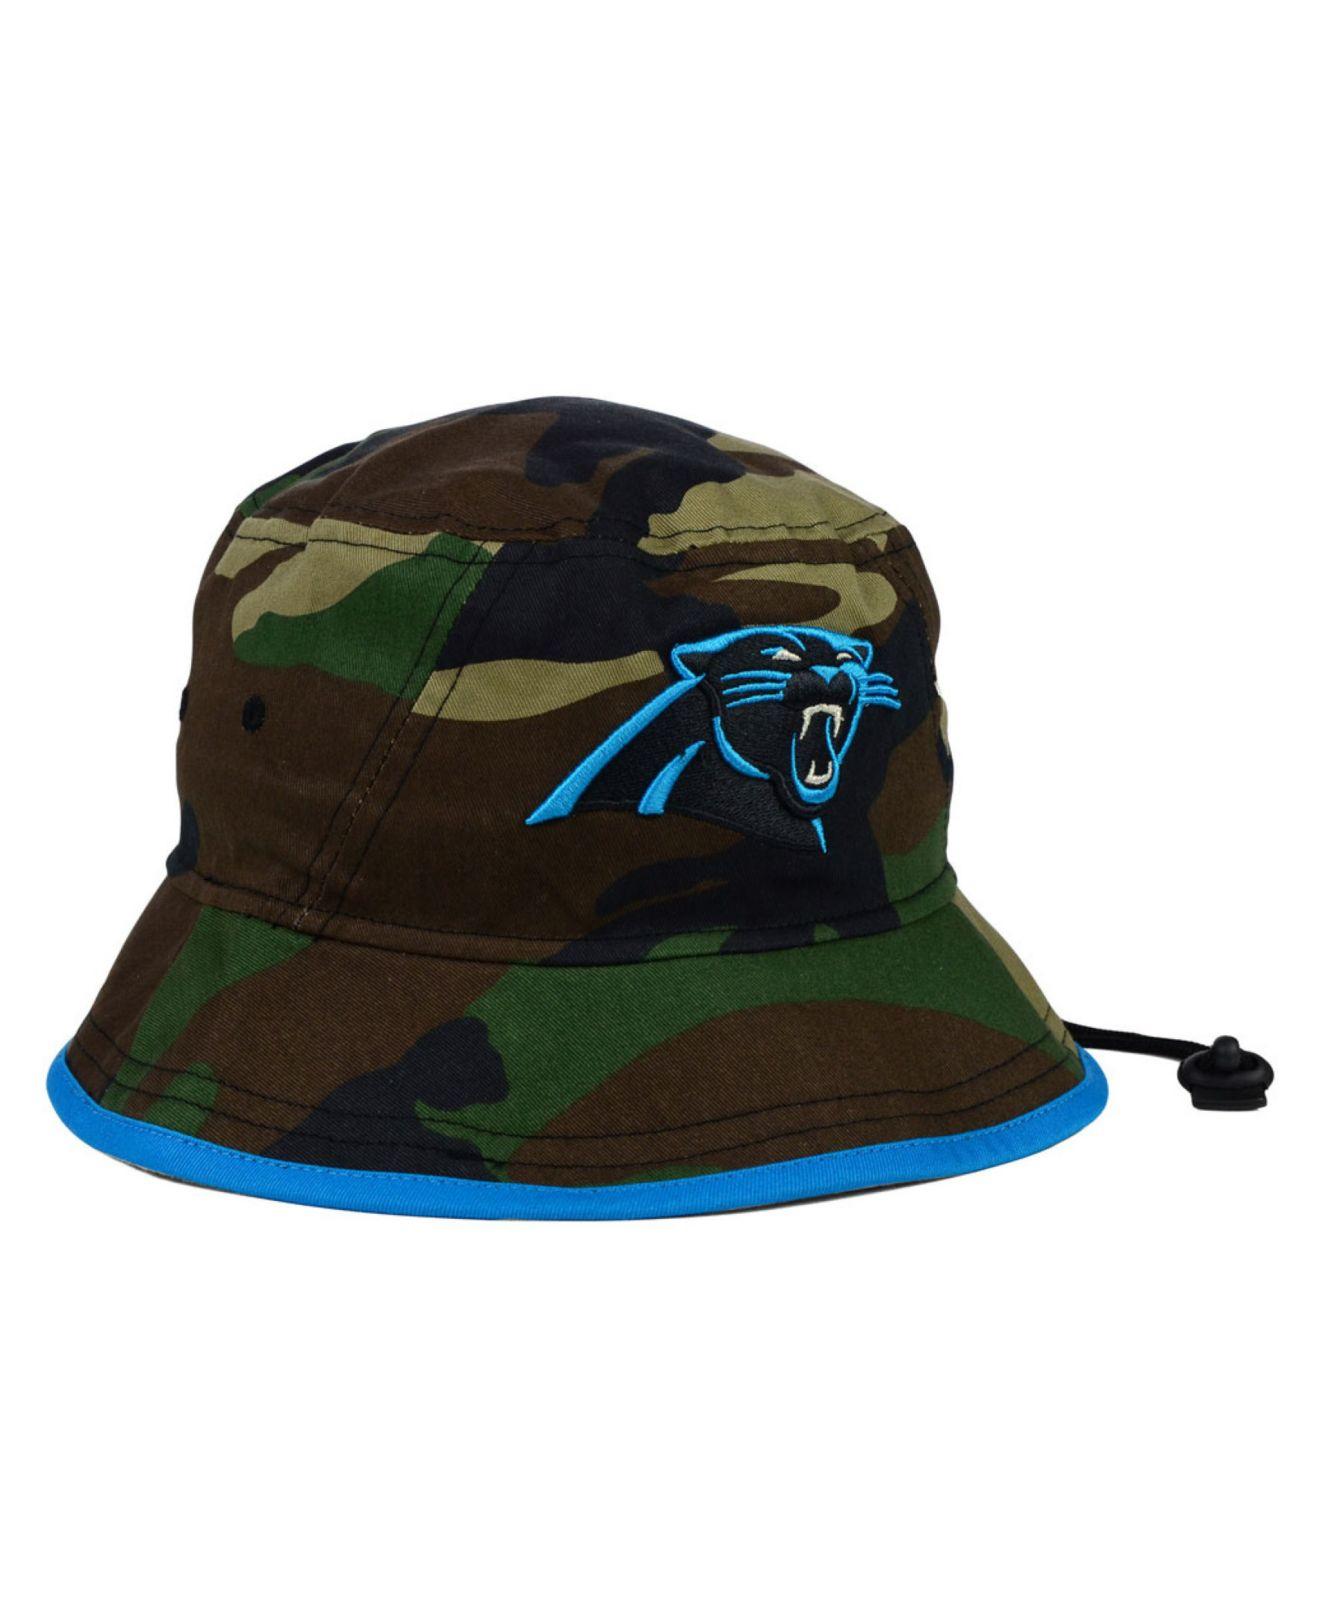 Lyst - KTZ Carolina Panthers Camo Pop Bucket Hat in Green for Men ce5901ffa